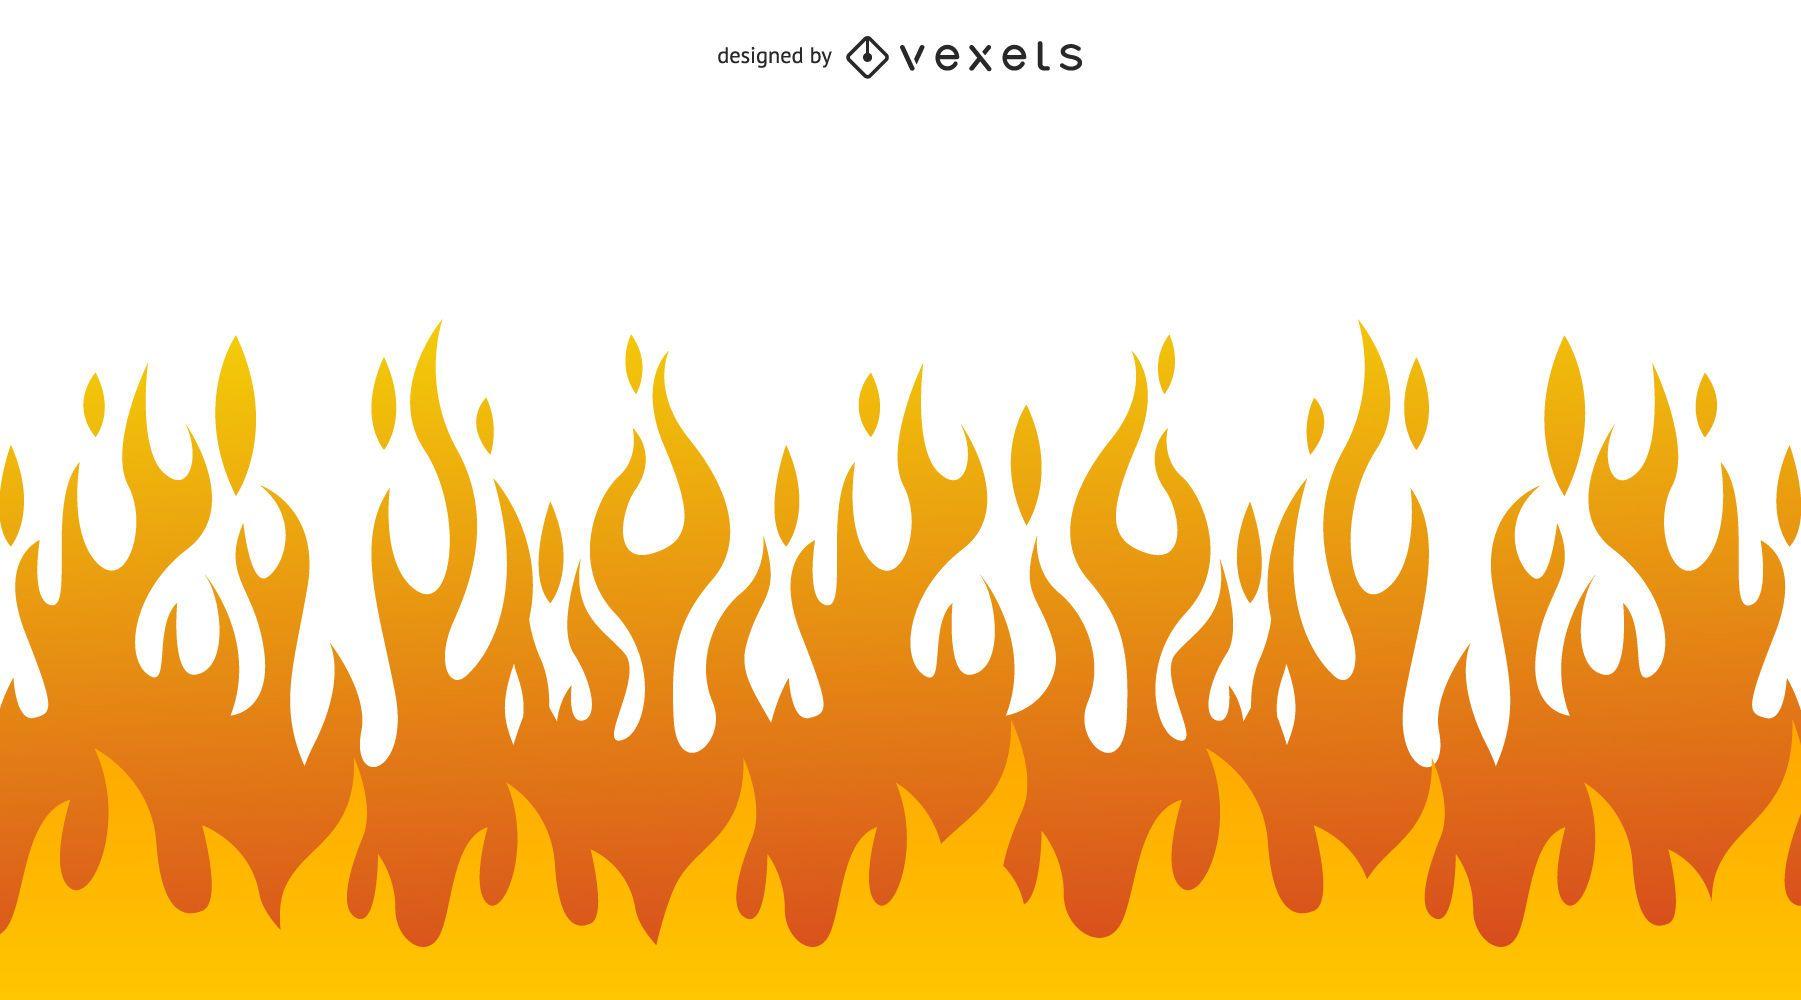 Simplistic flame illustration